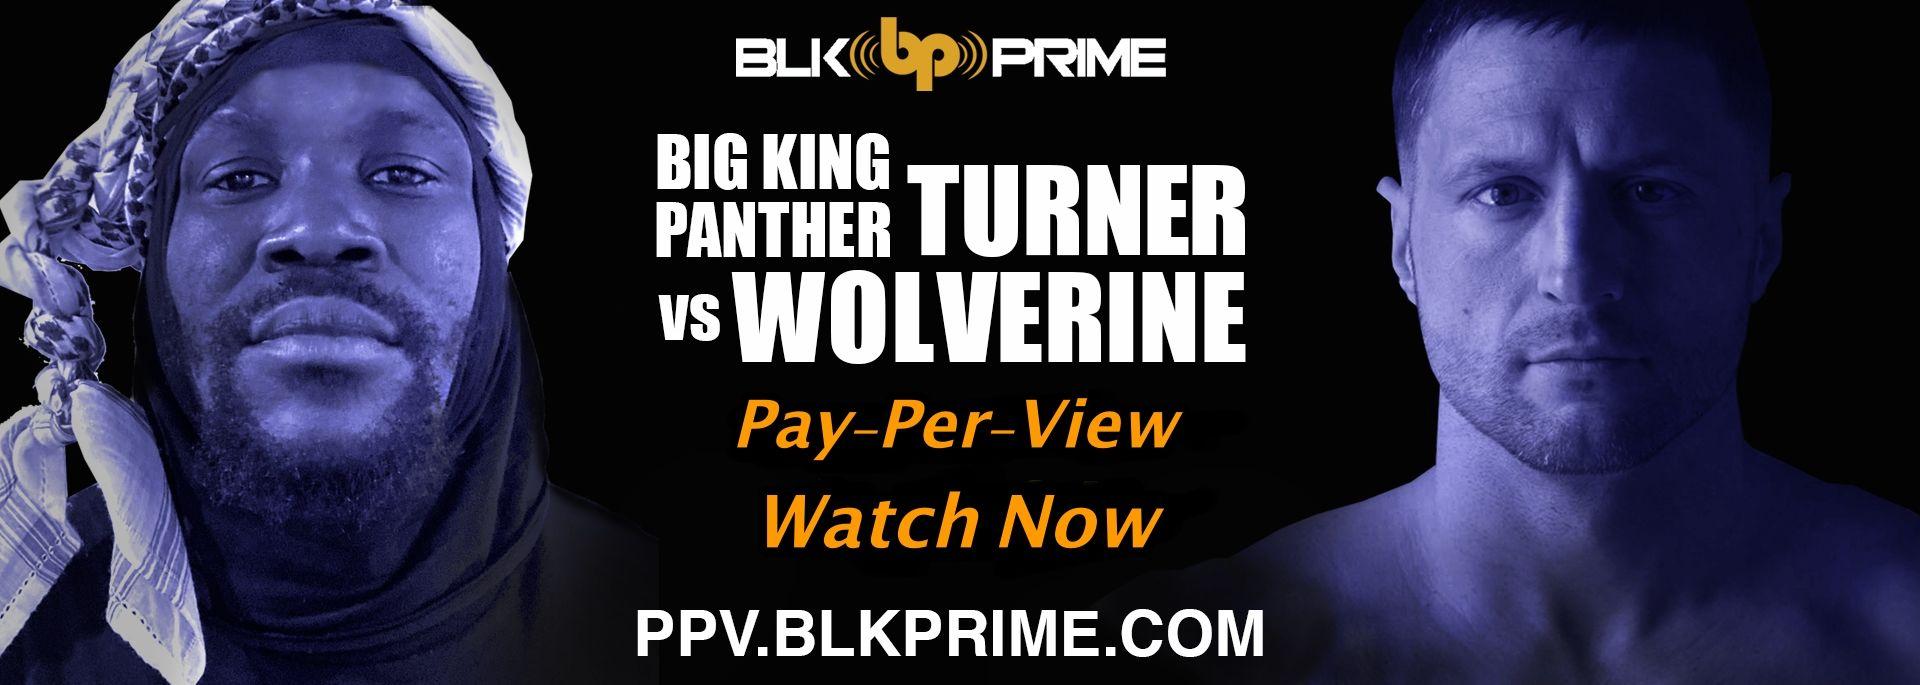 Big King Panther Turner Vs Wolverine